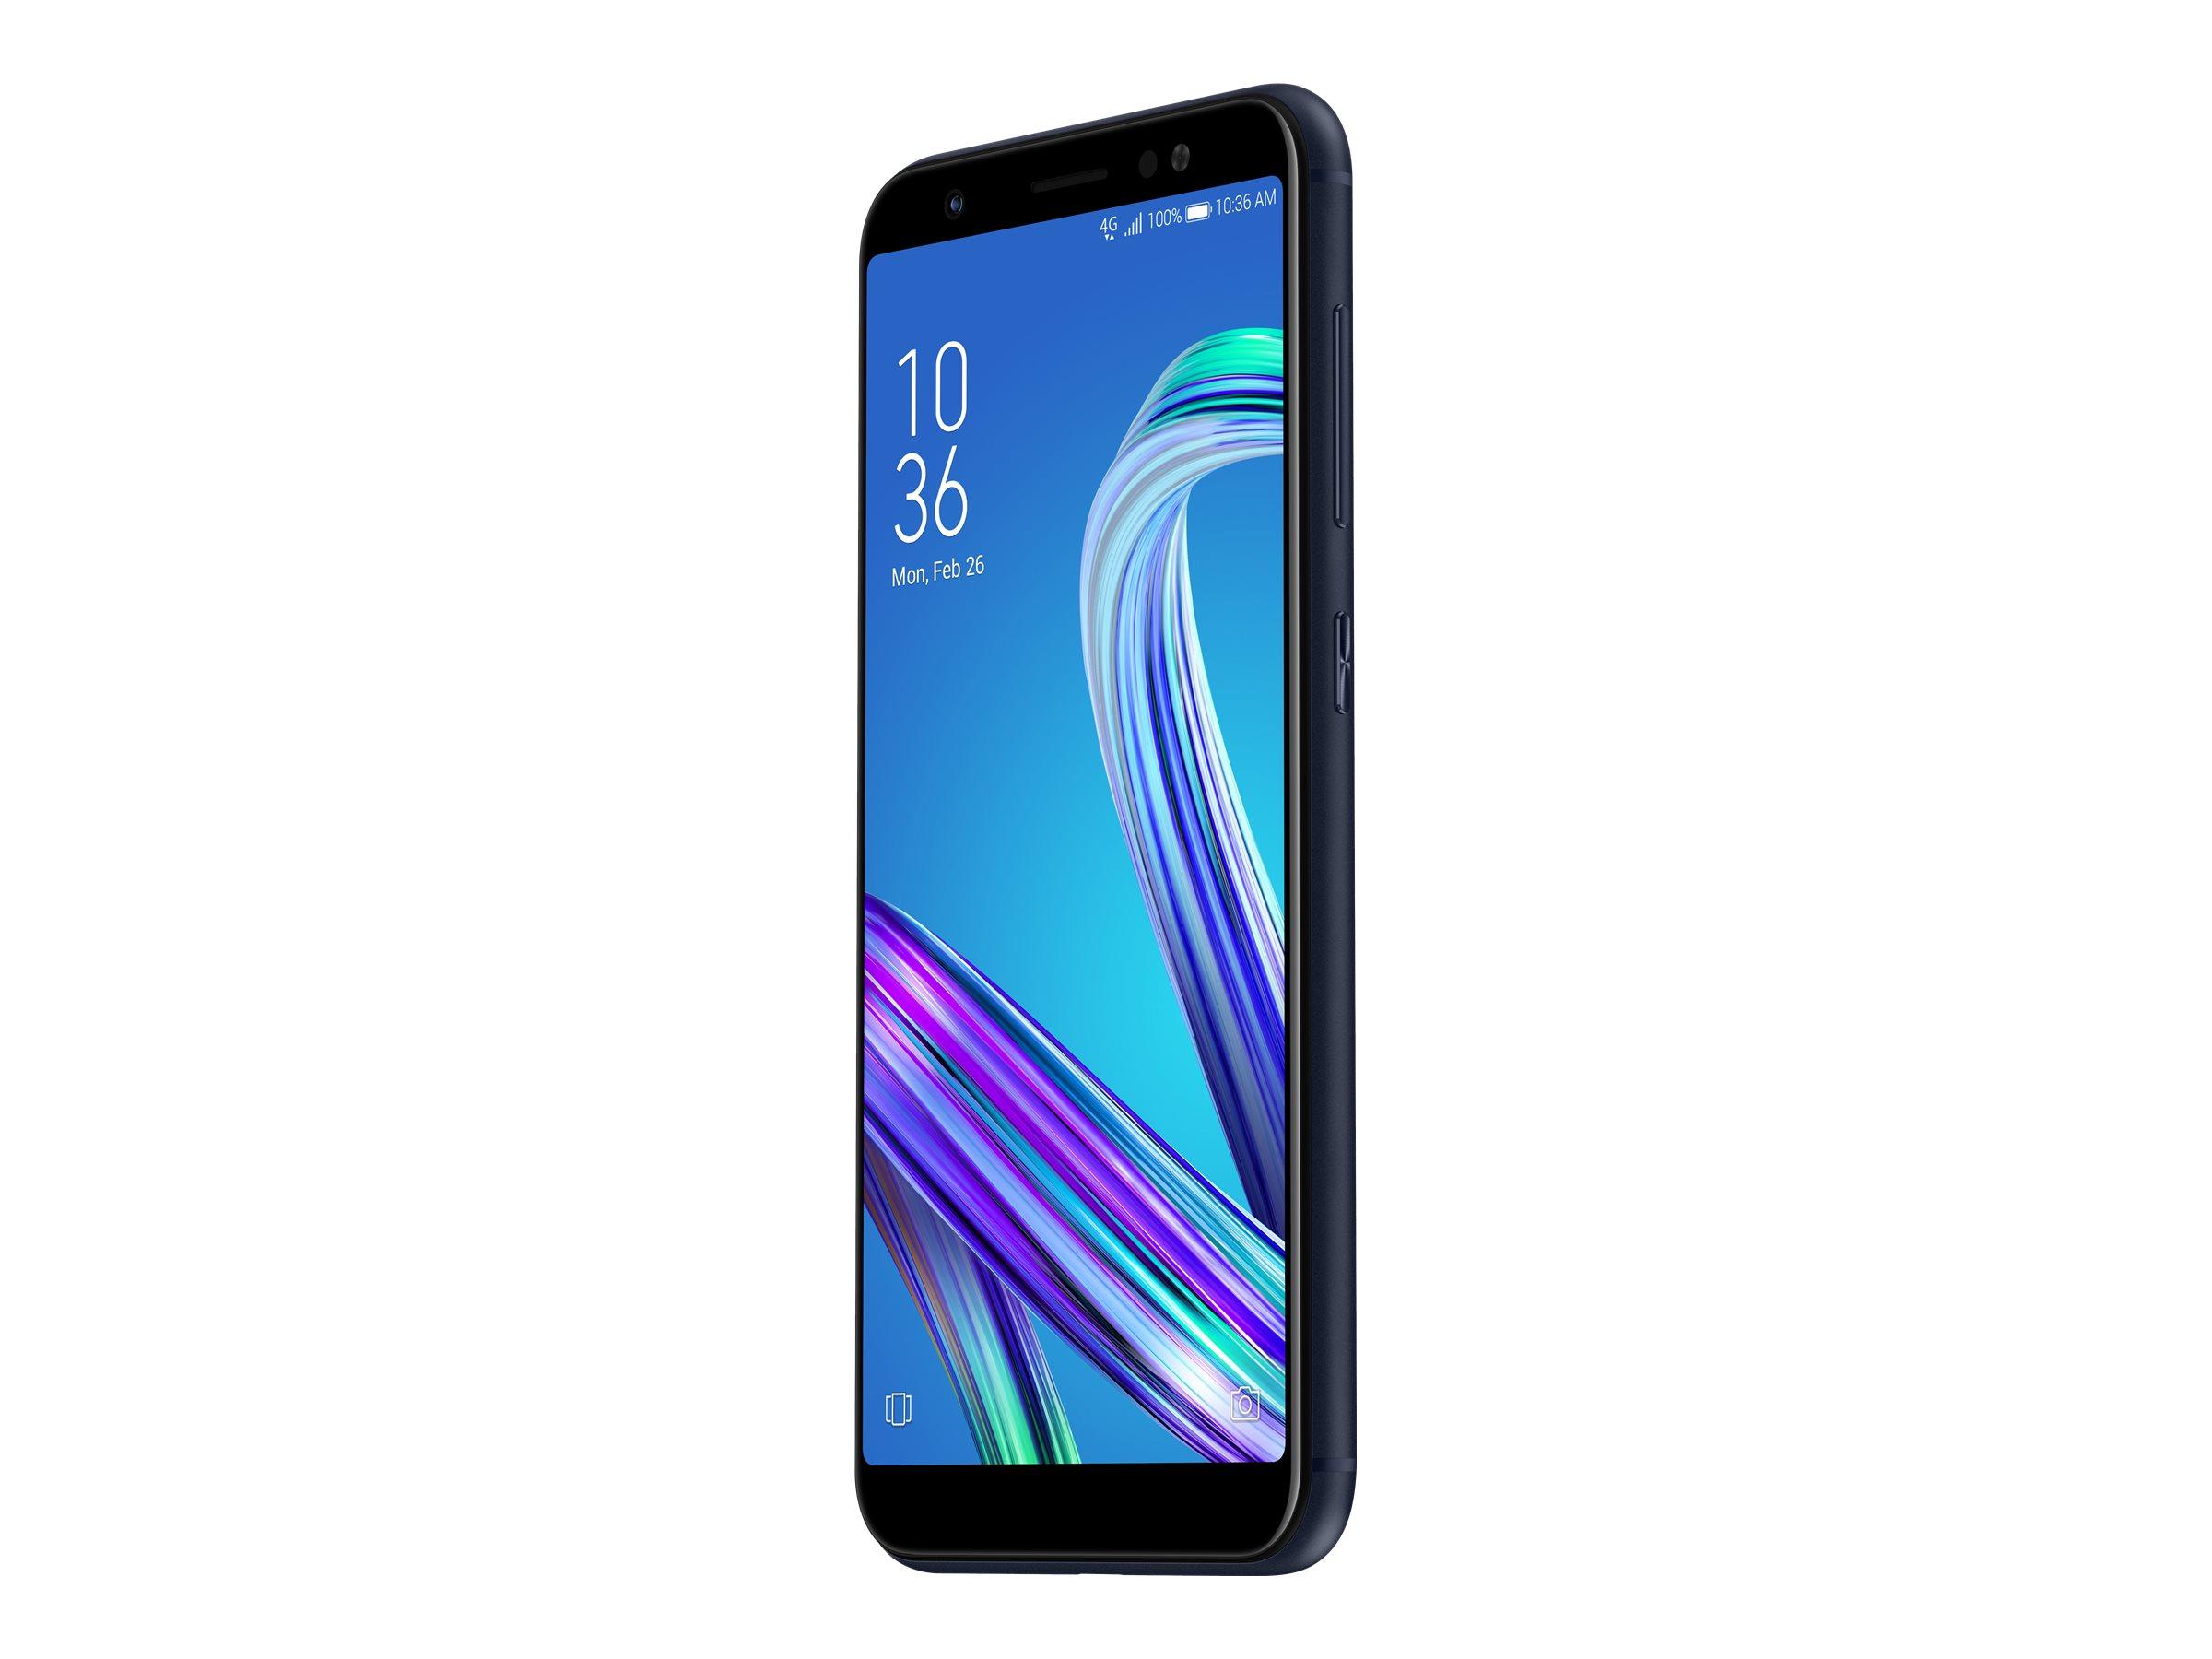 Telefon Mobil Asus ZenFone Max M1 ZB555KL 32GB Flash 3GB RAM Dual SIM 4G Black